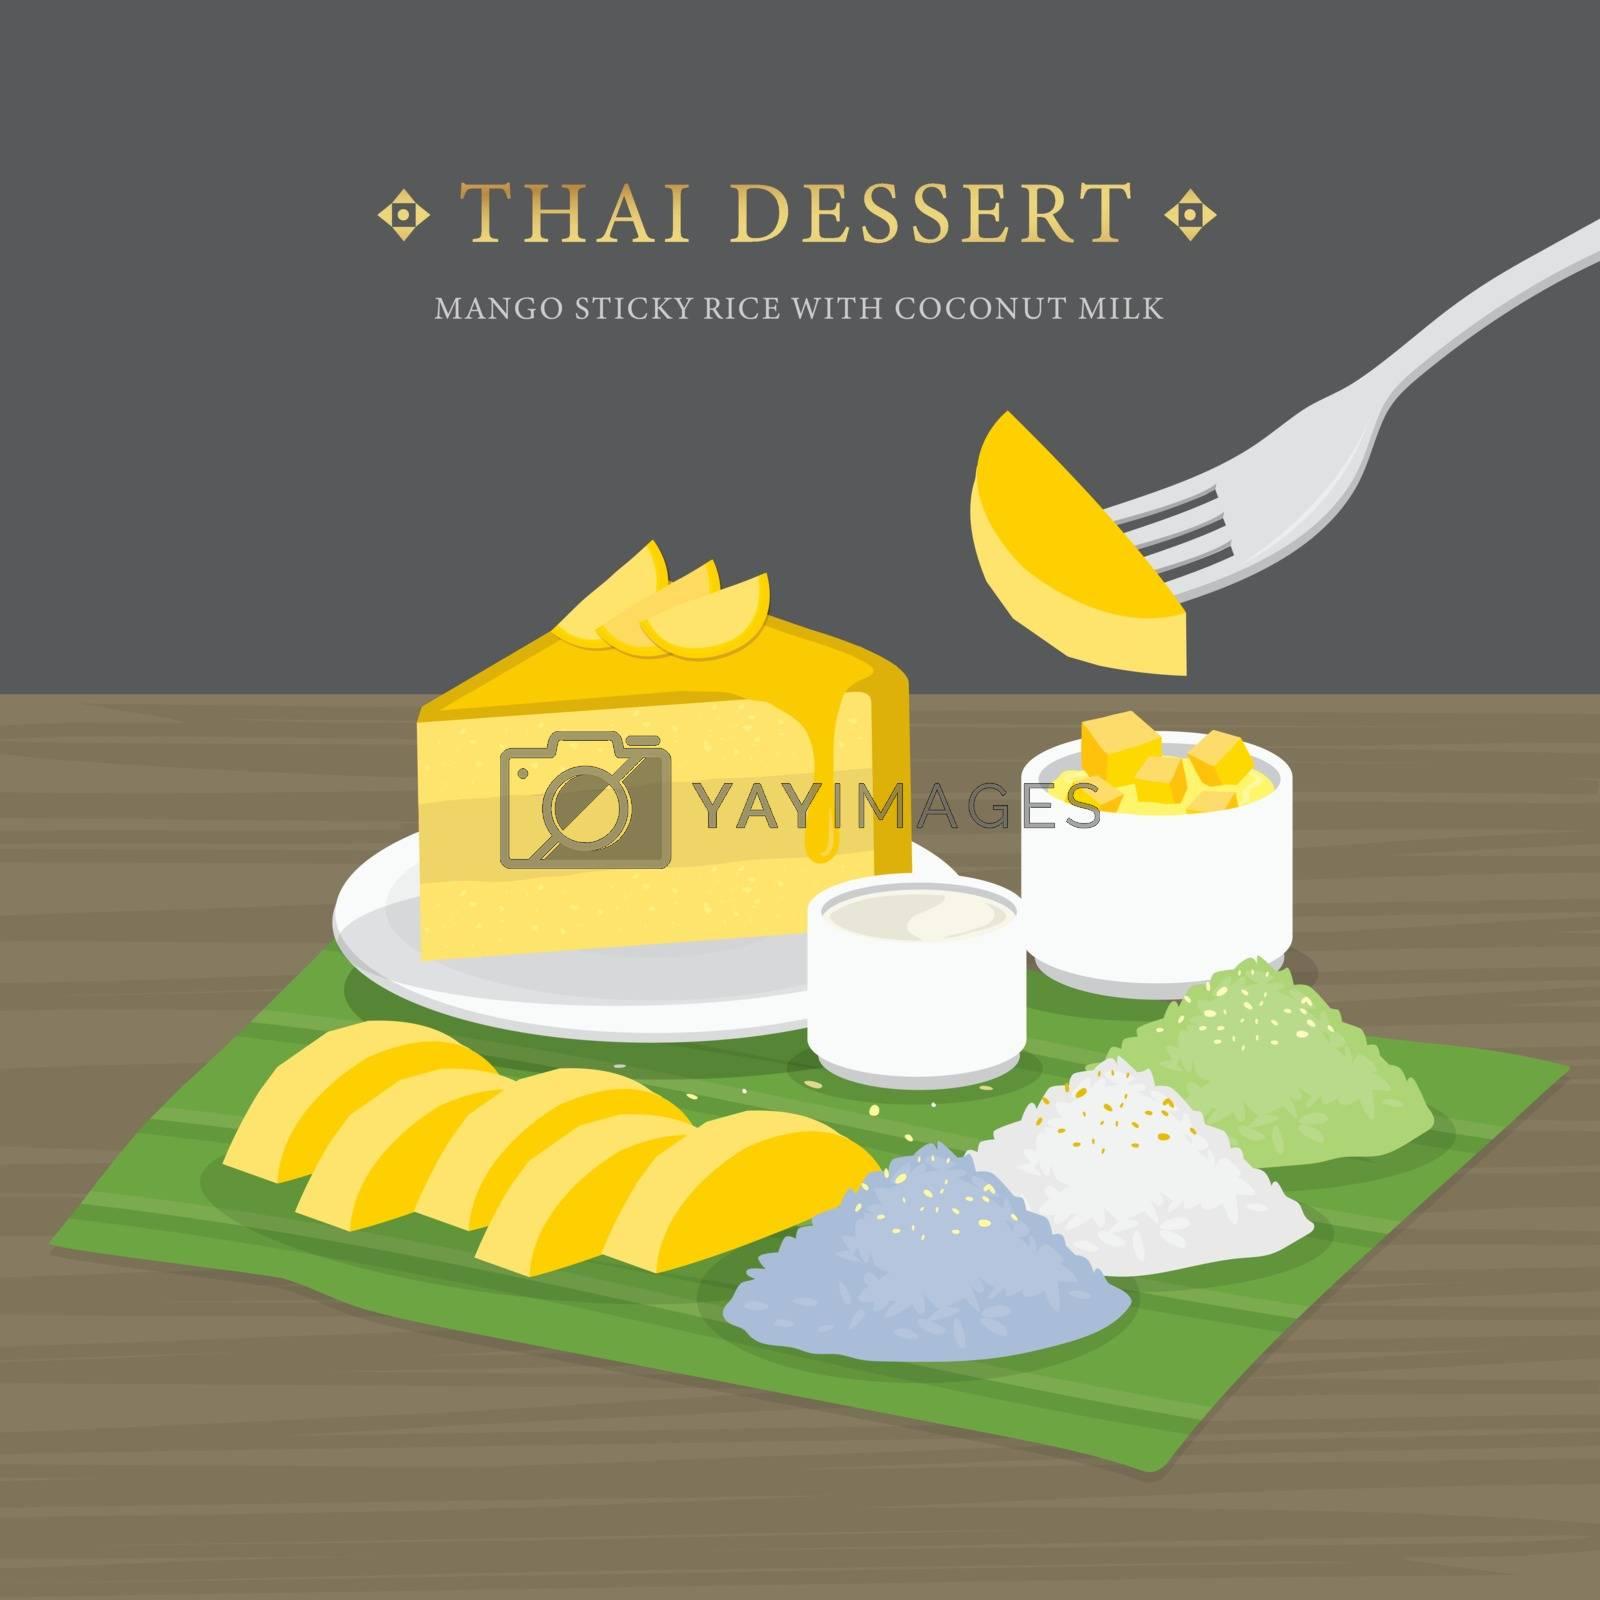 Thai Dessert, Mango and sticky rice with coconut milk and mango sauce. Cartoon Vector illustration